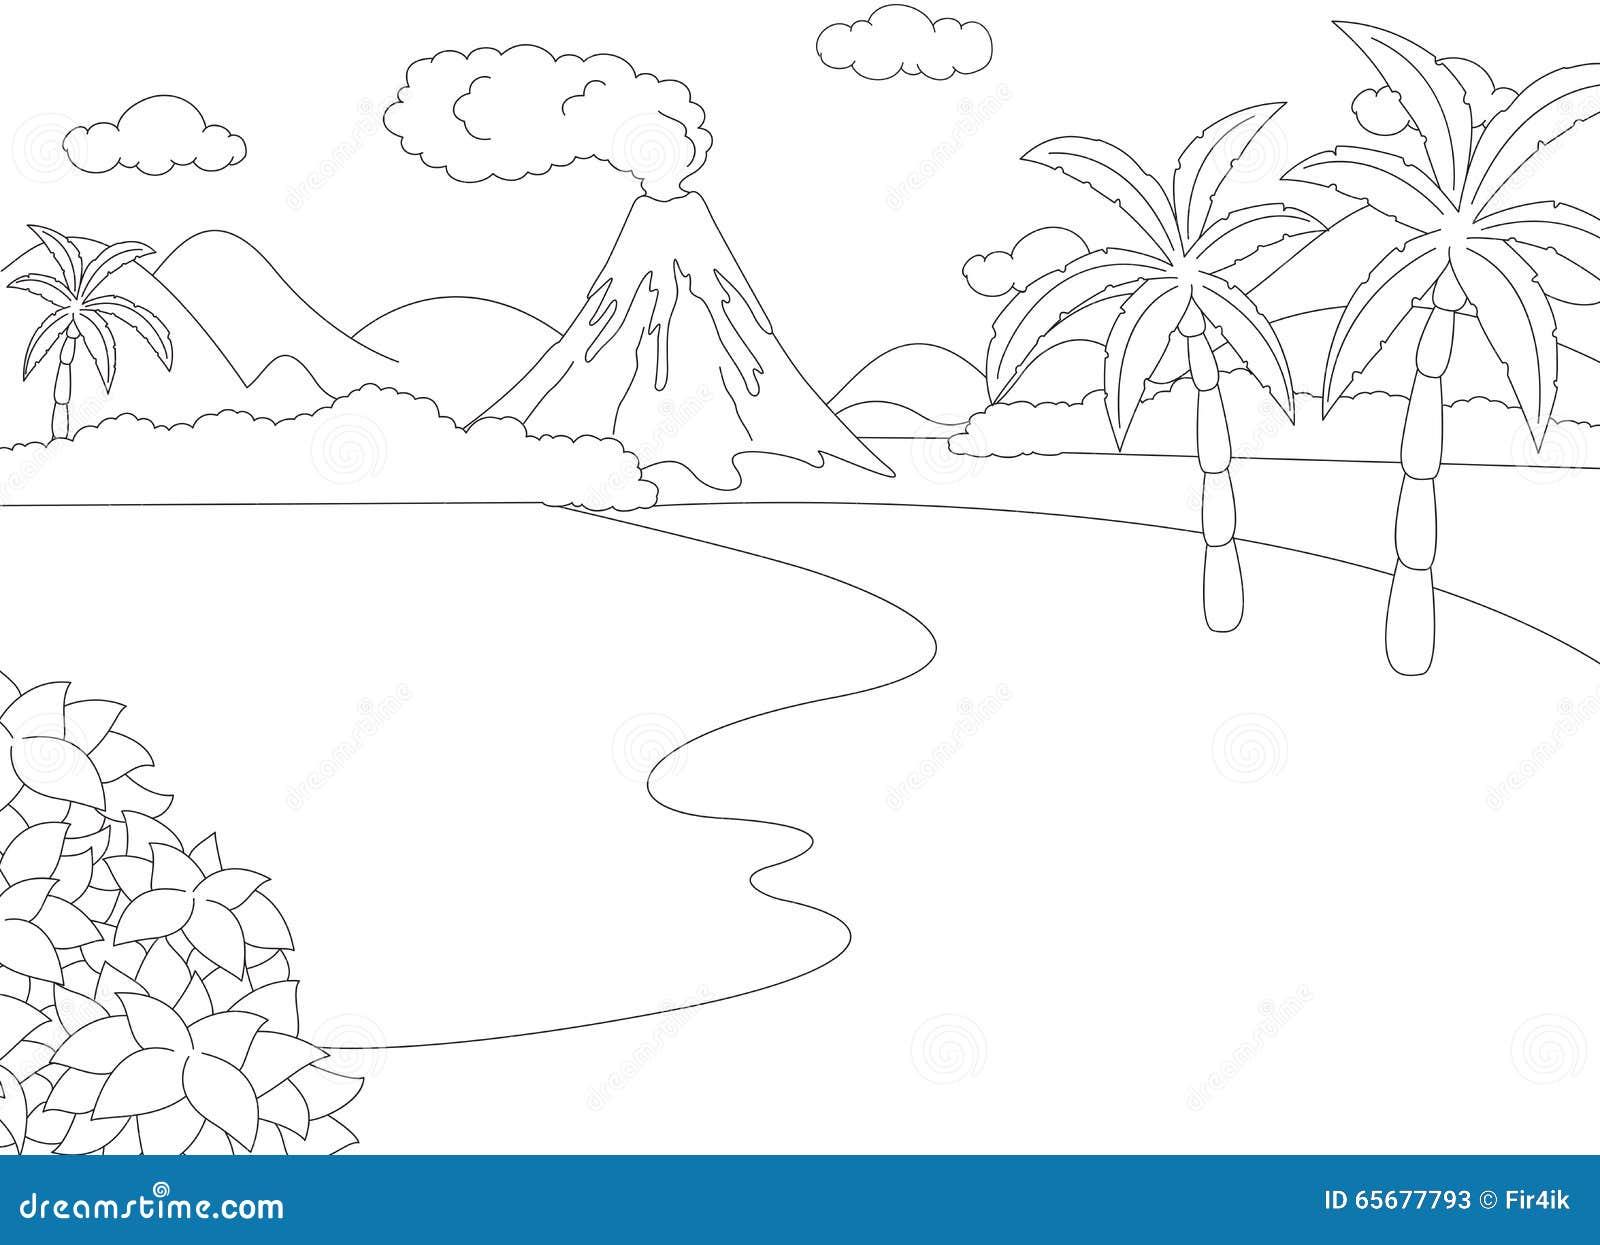 Libro Para Colorear Para Niños: Erupción Volcánica Libro De Colorear Para Los Niños